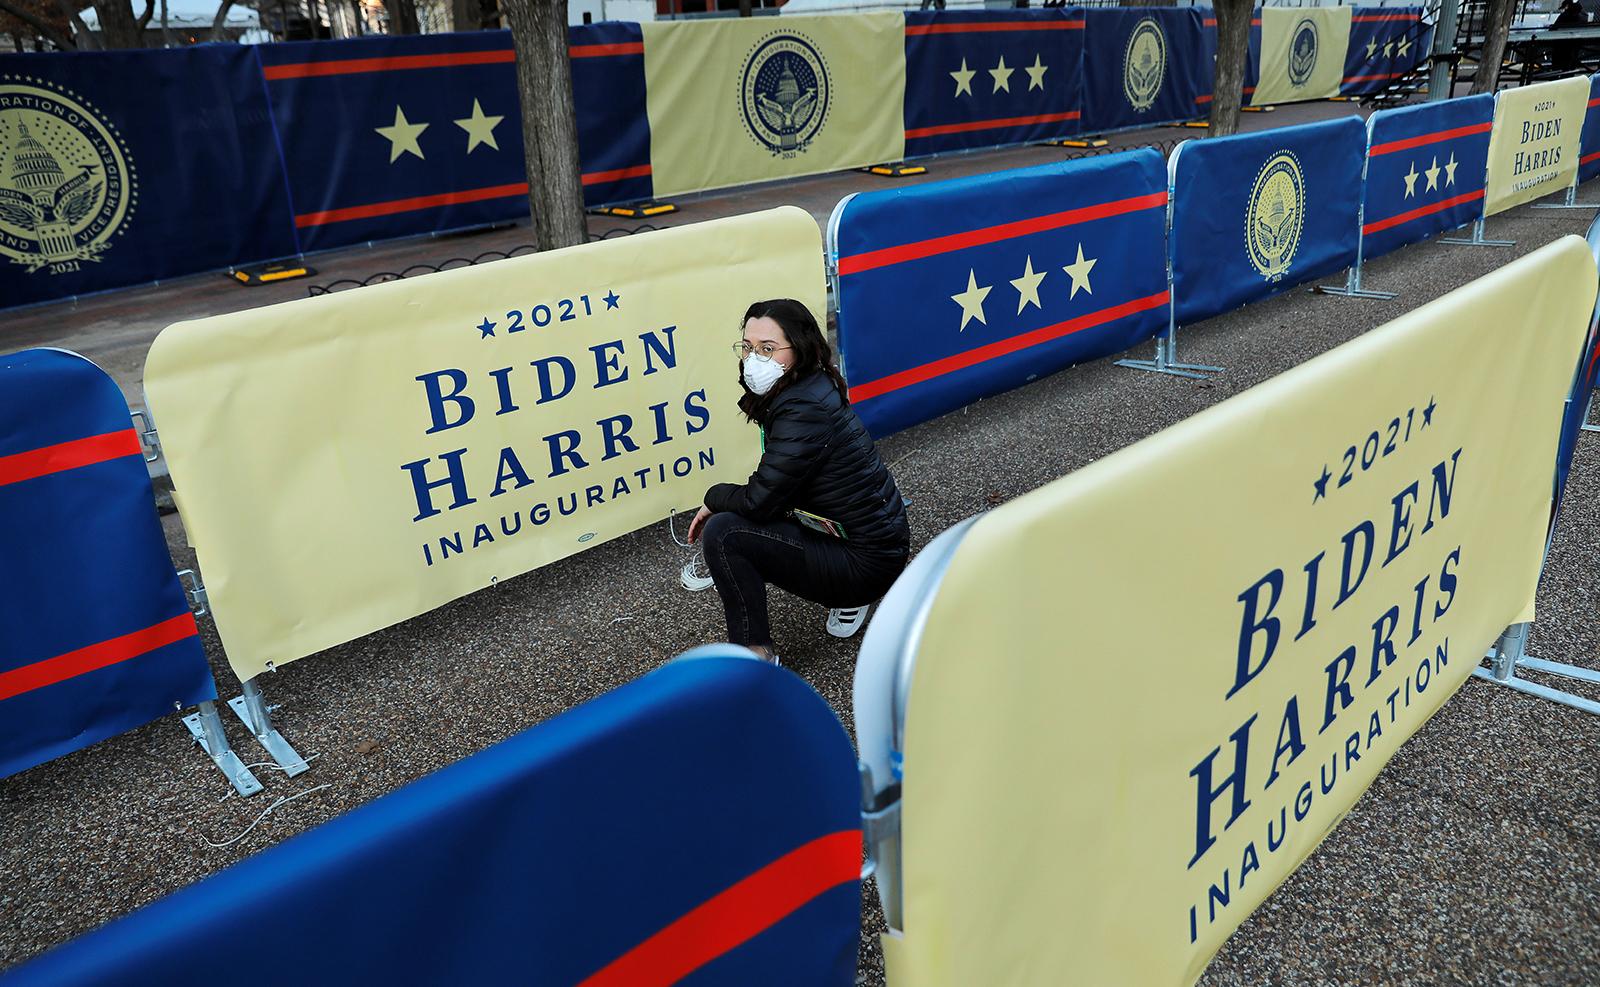 A volunteer sets up preparations for U.S. President-elect Joe Biden's inauguration, in Washington, D.C., U.S., January 18, 2021. Reuters